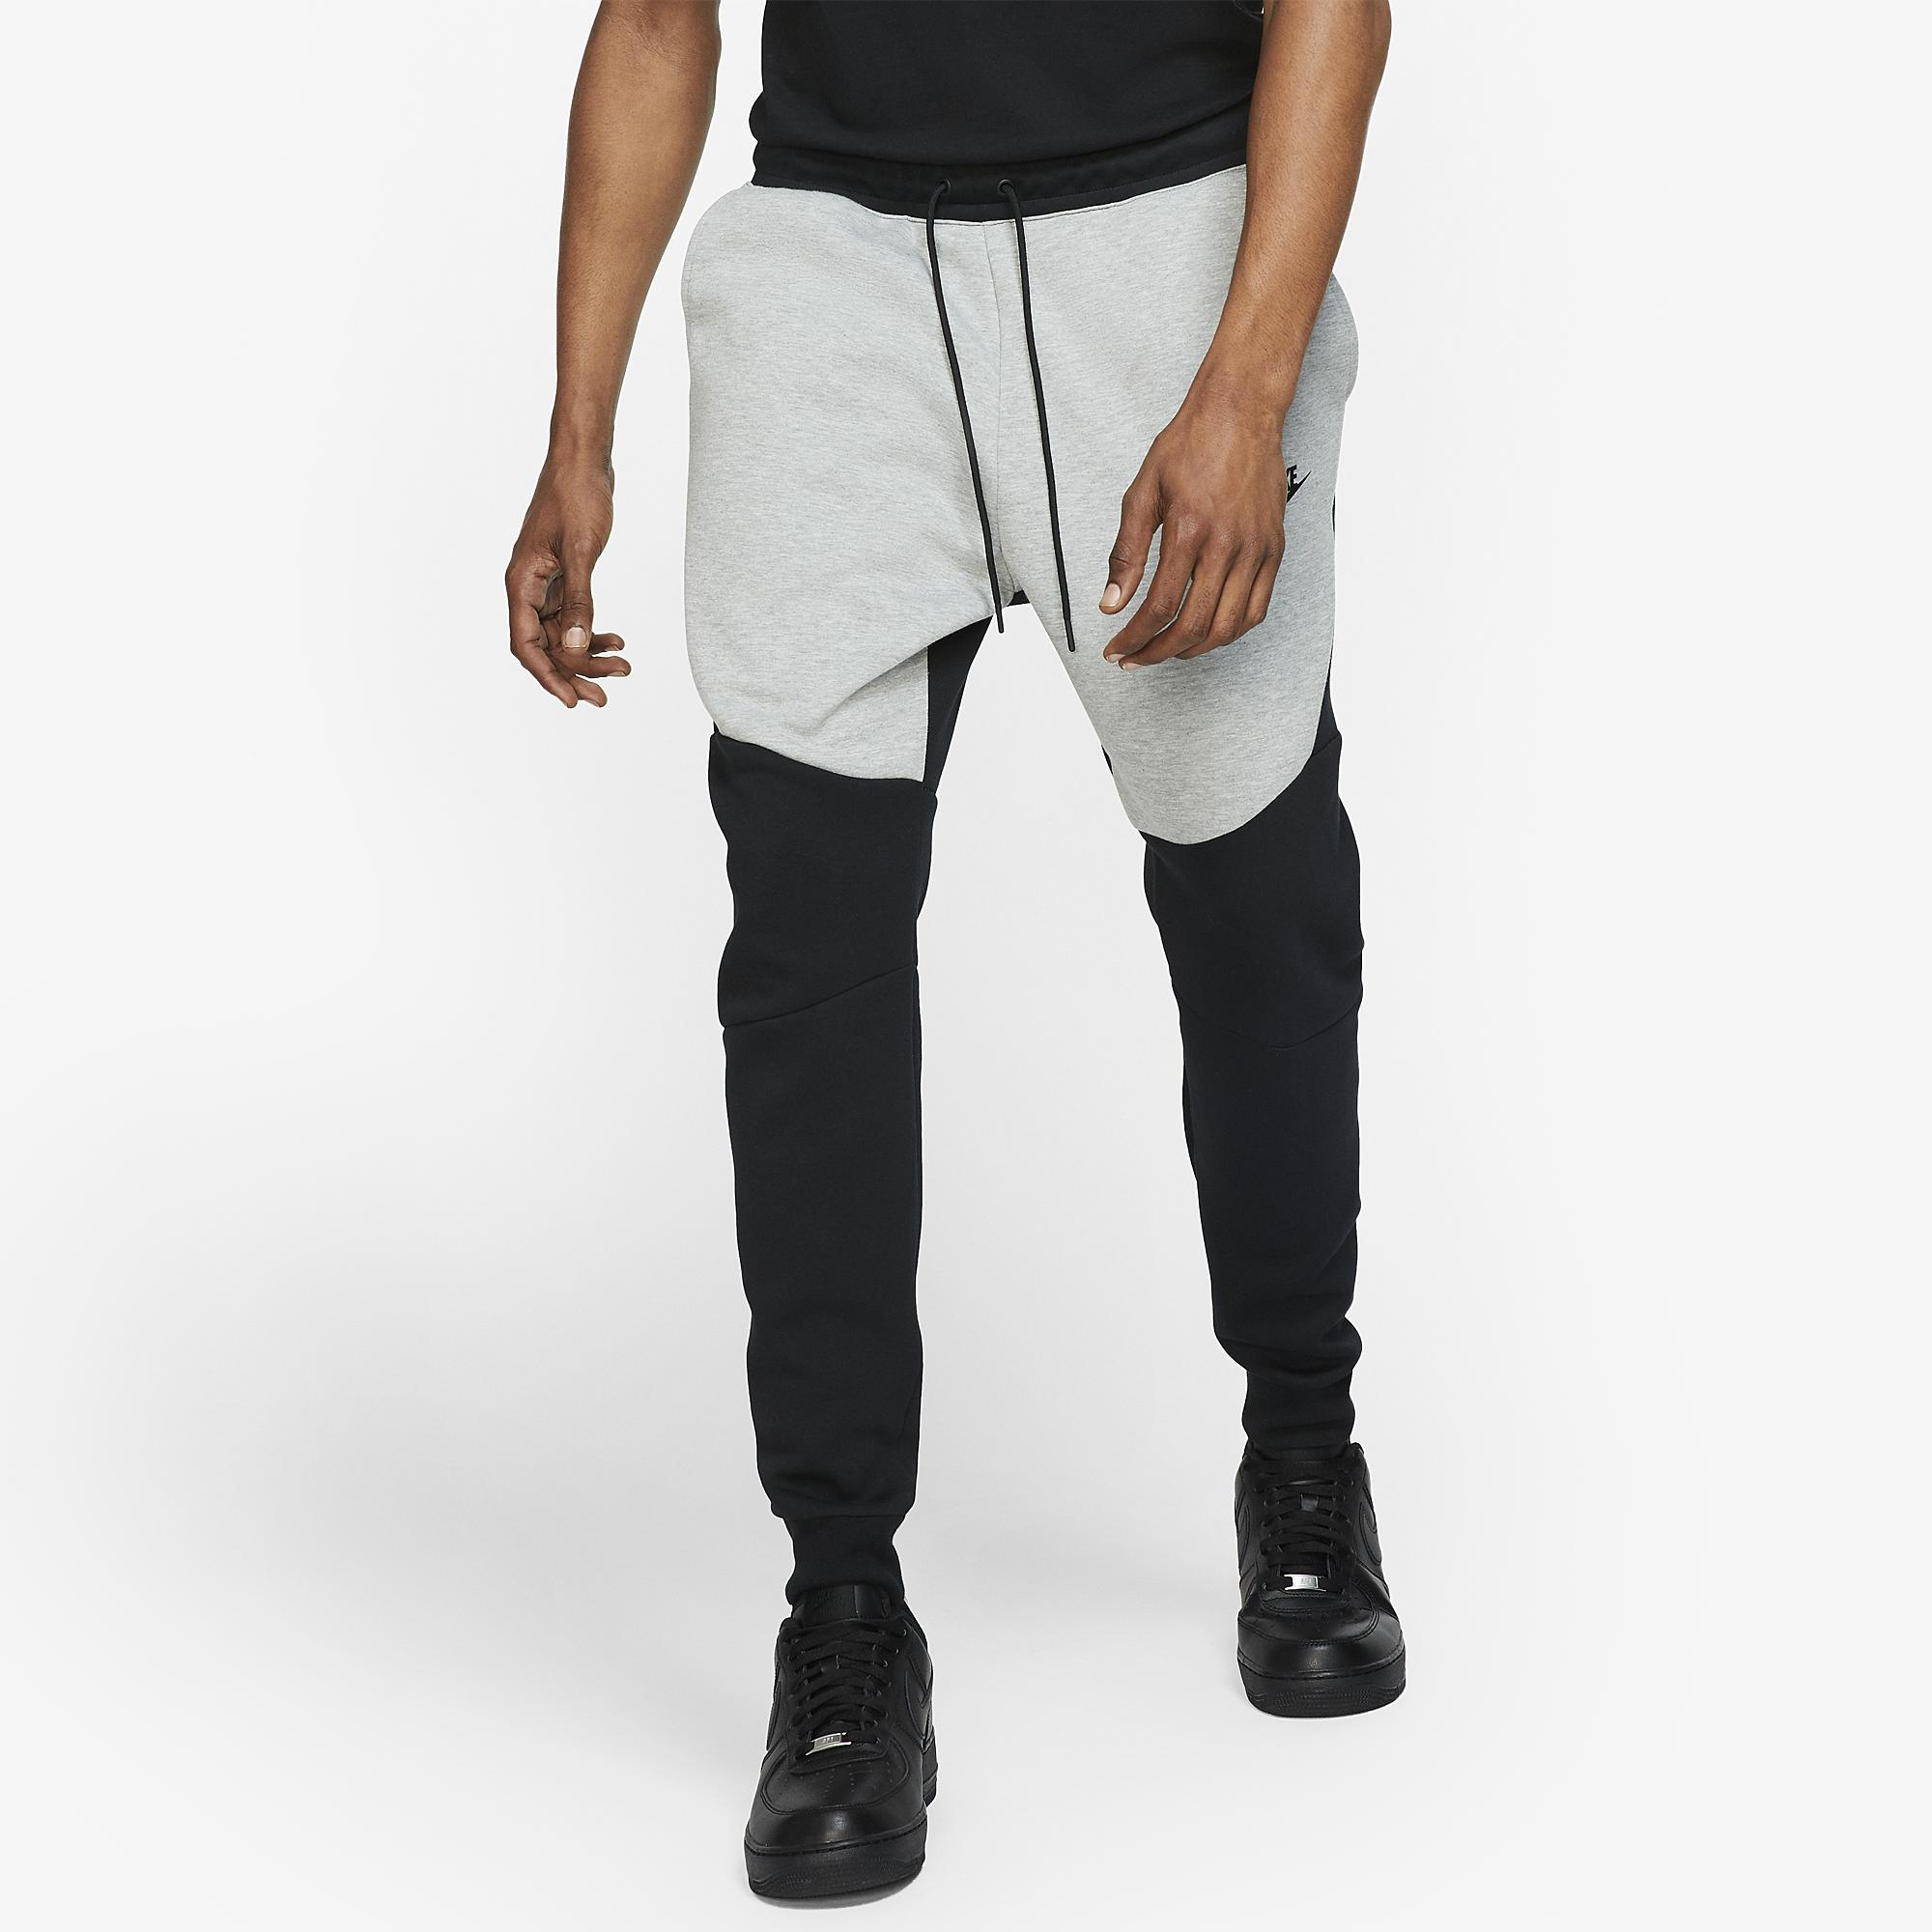 Nike Tech Fleece Joggers In Black Dark Grey Heather Gray For Men Save 28 Lyst